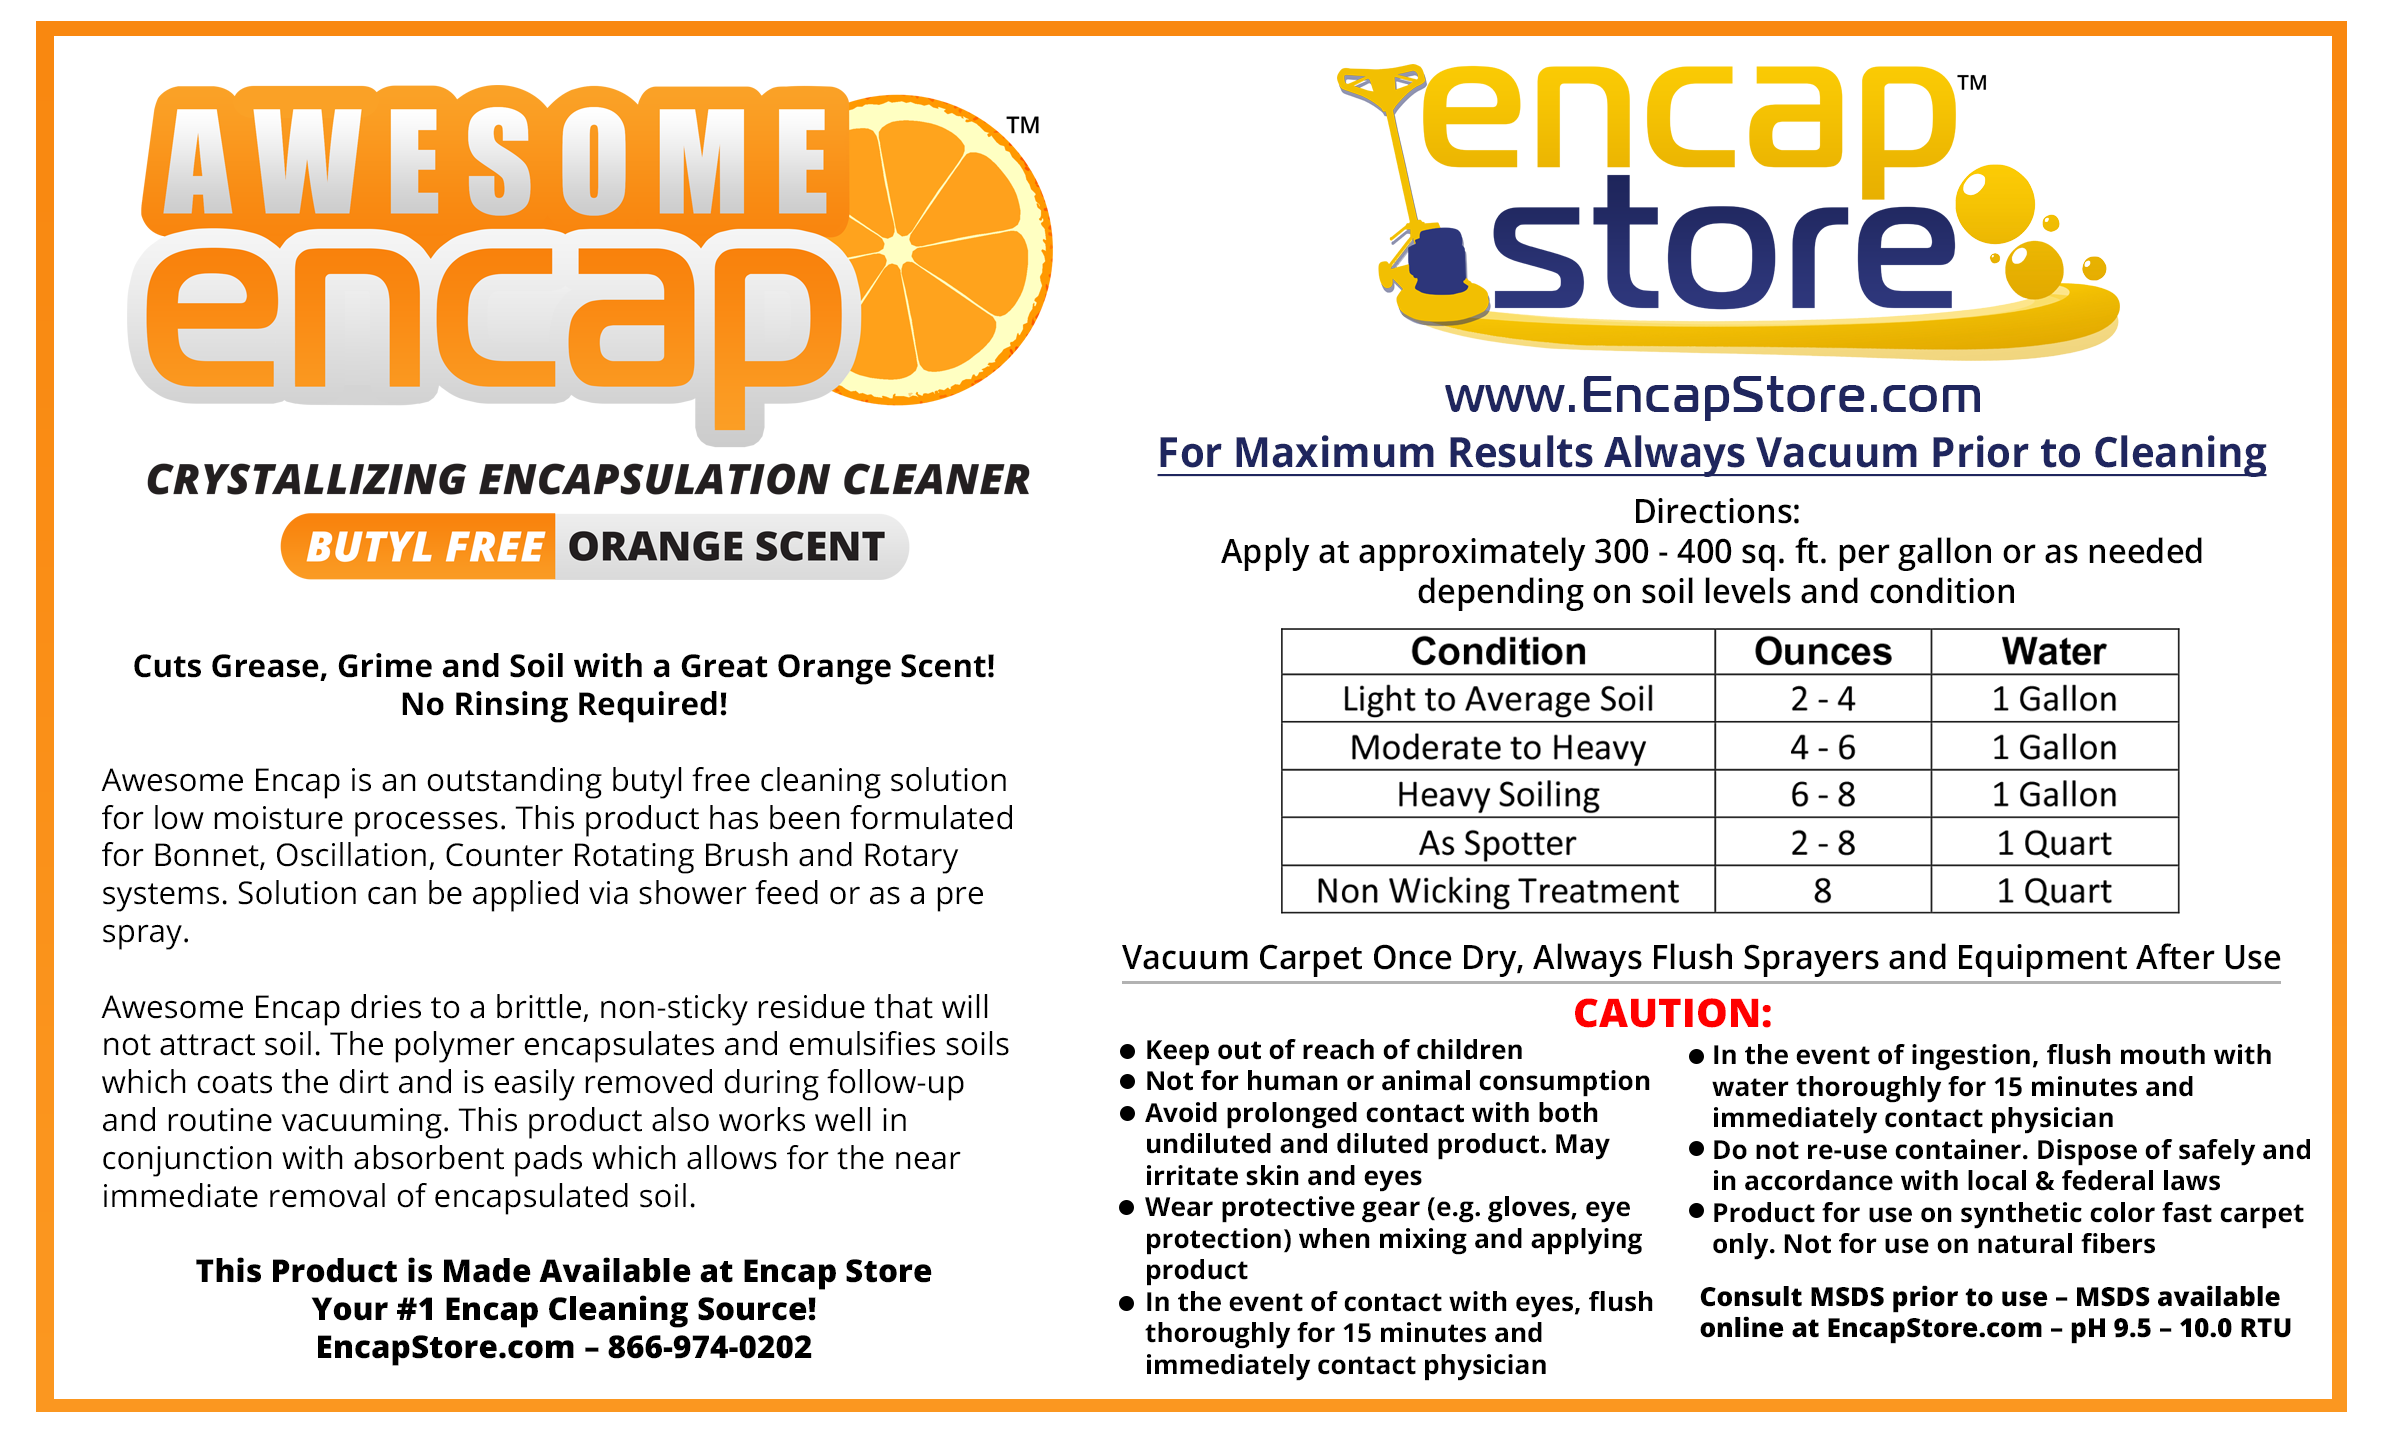 Awesome Encap Label Actual Size Big V2-2